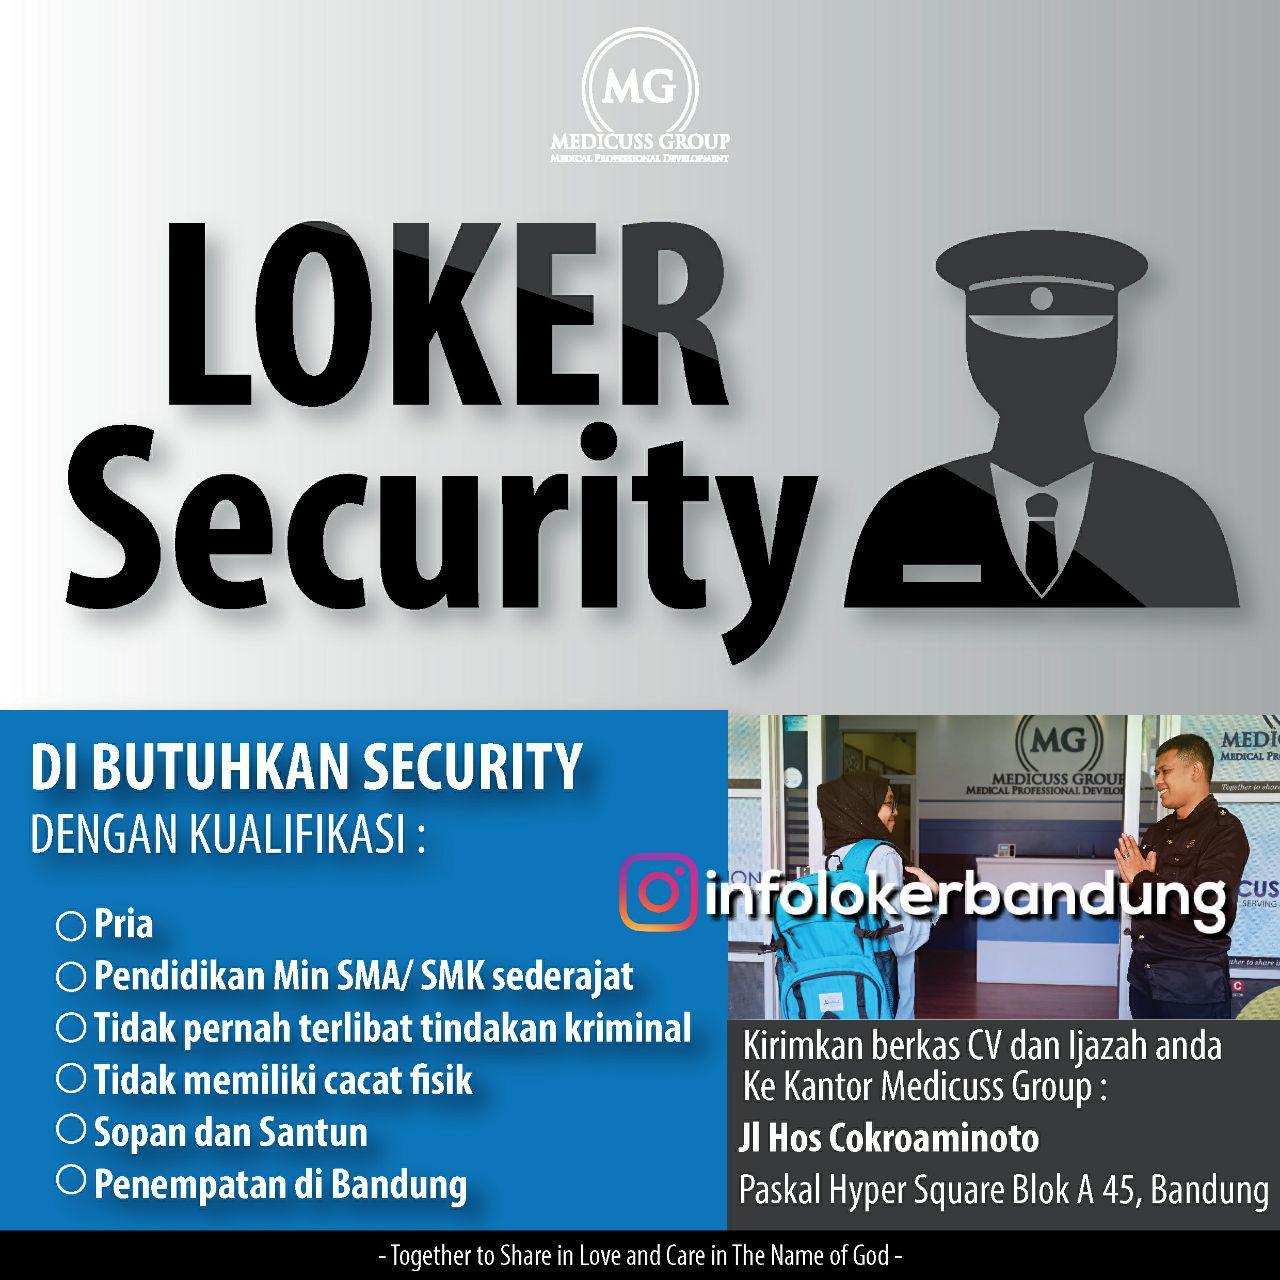 Lowongan Kerja Security Medicuss Group Bandung Januari 2018